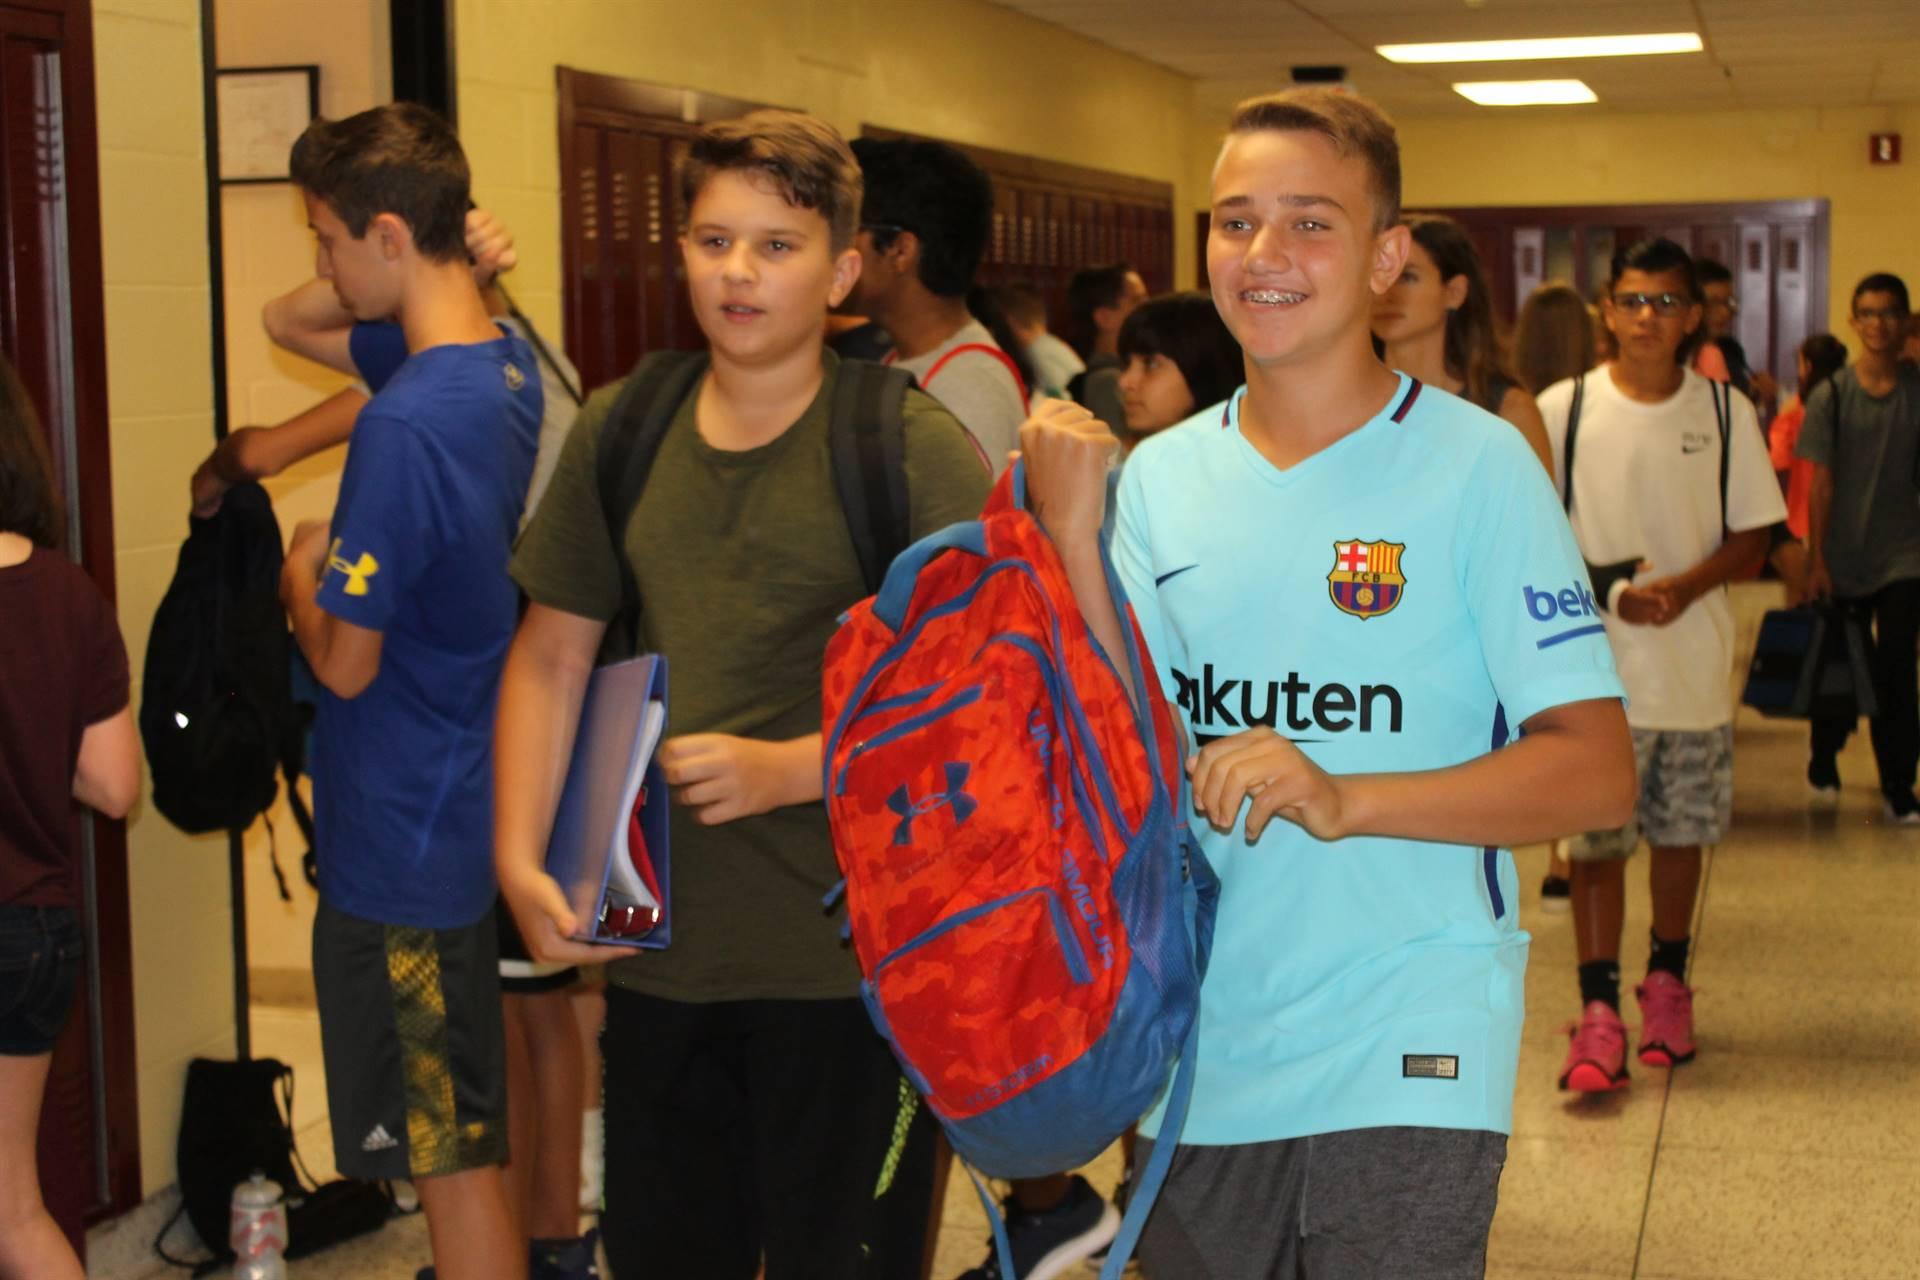 students walking through halls